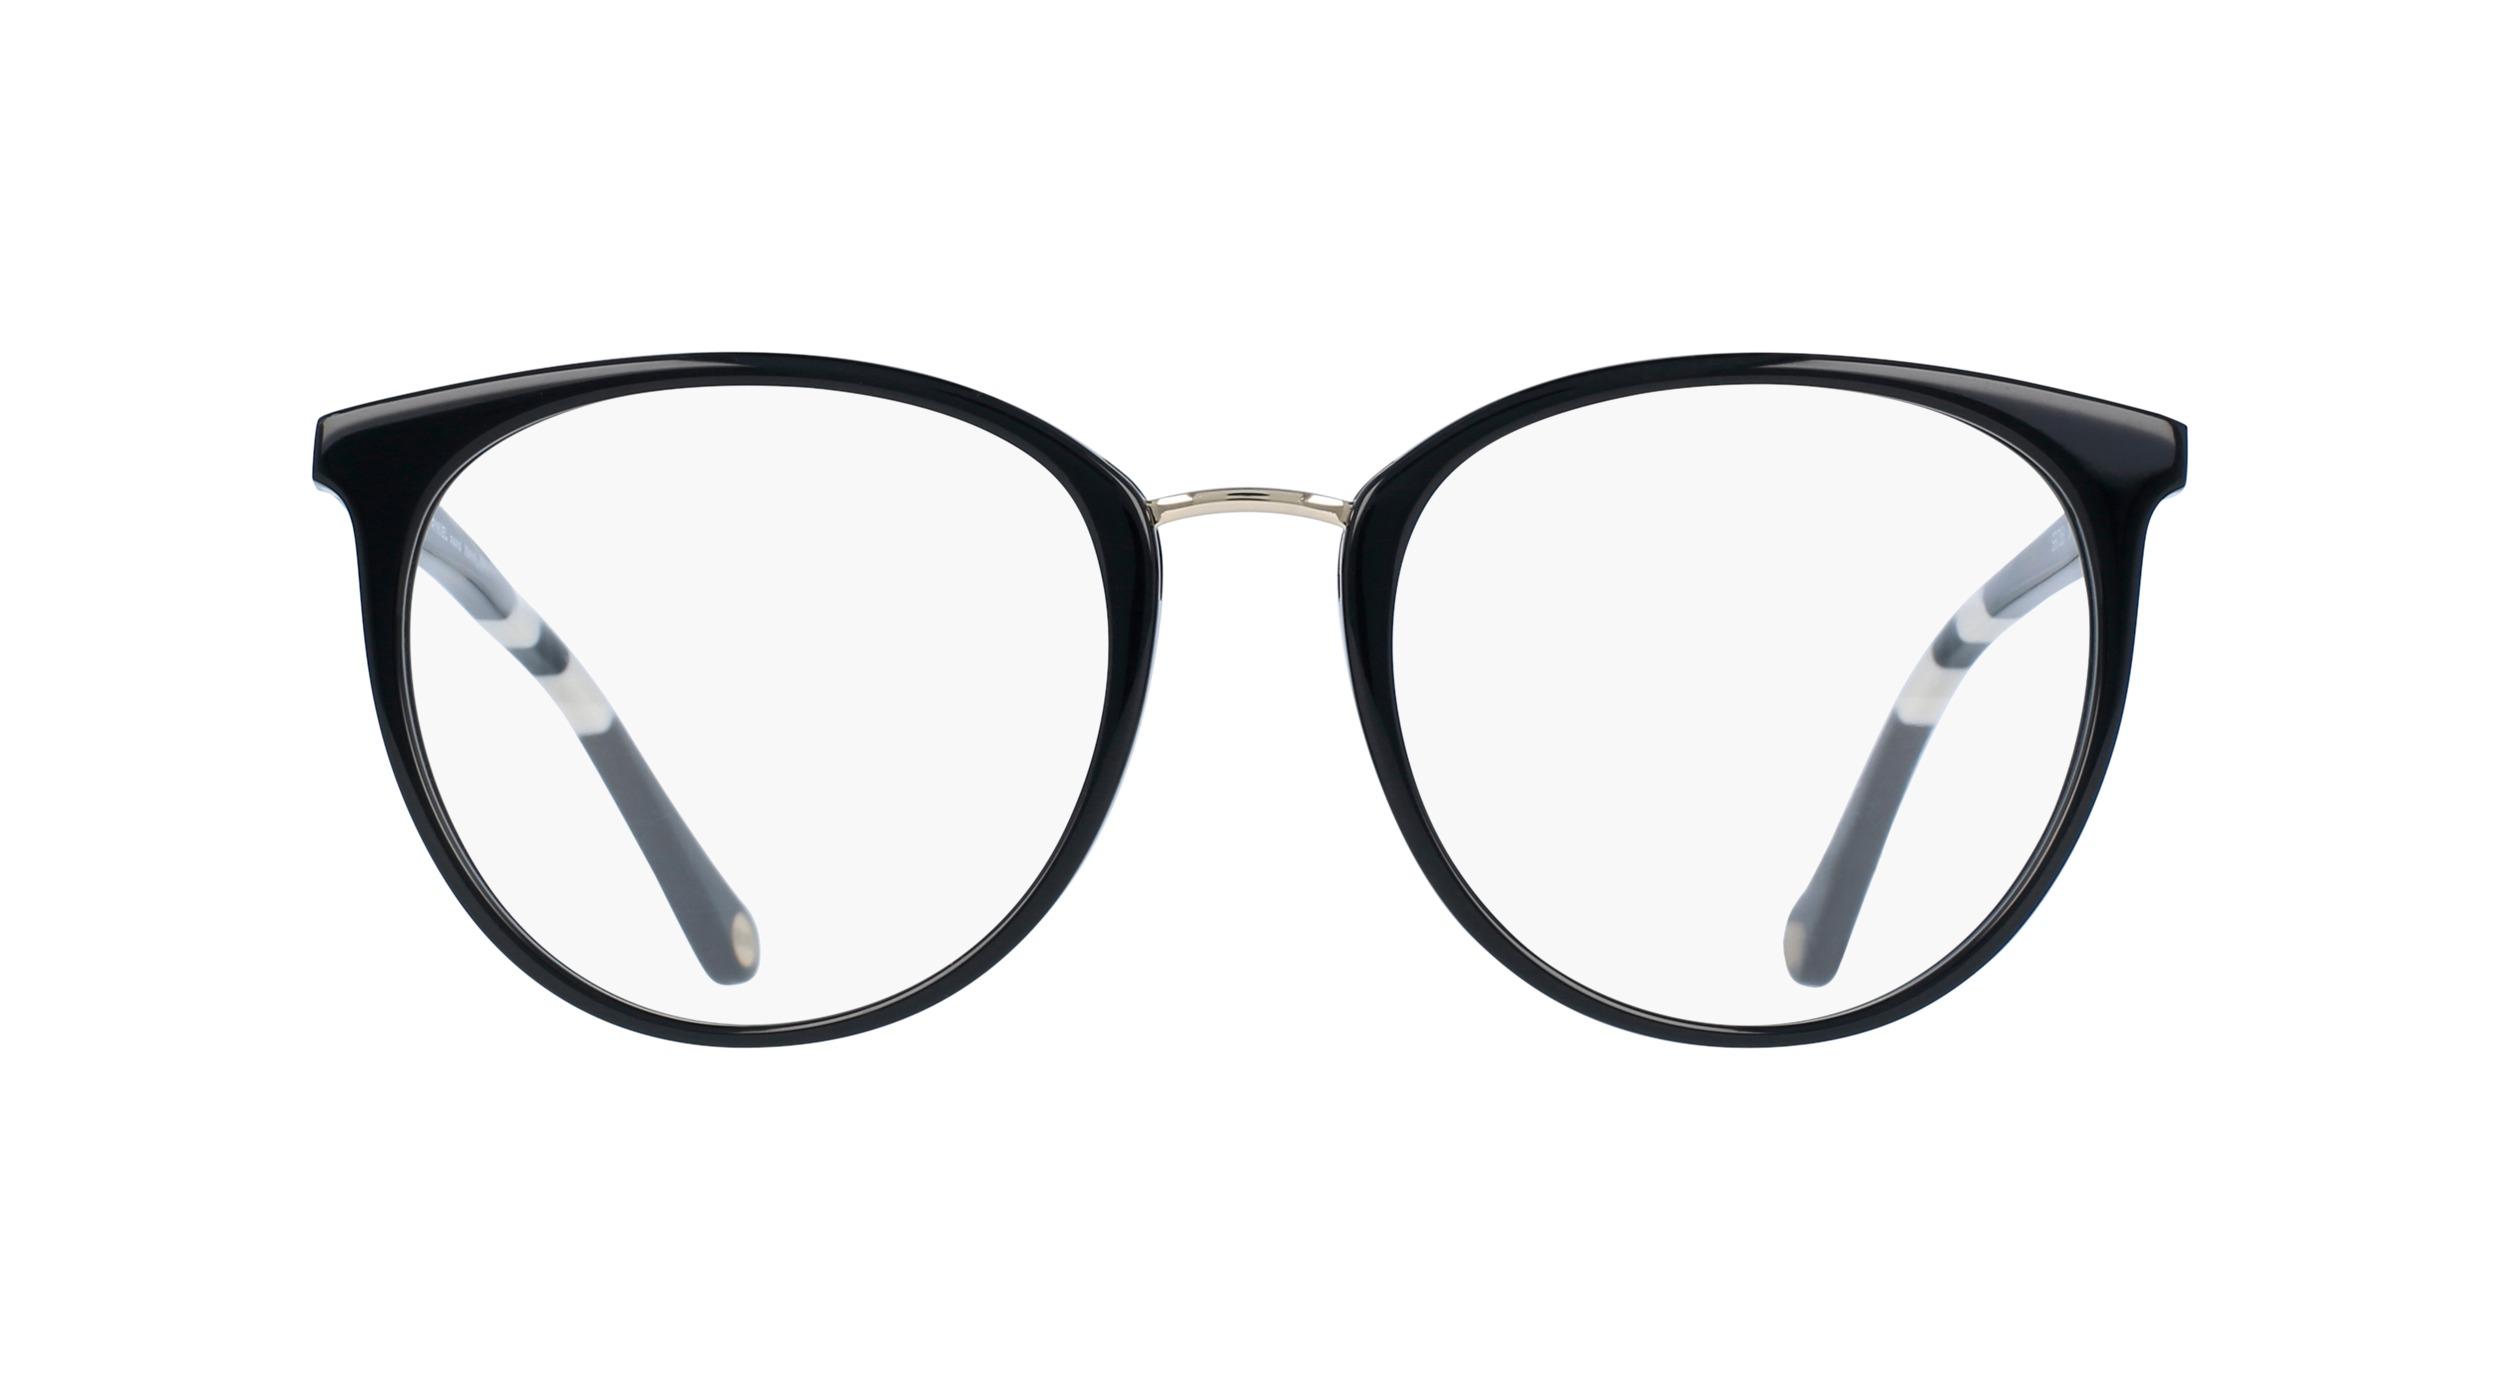 optic2000-lunettes-soleil-sonia-rykiel